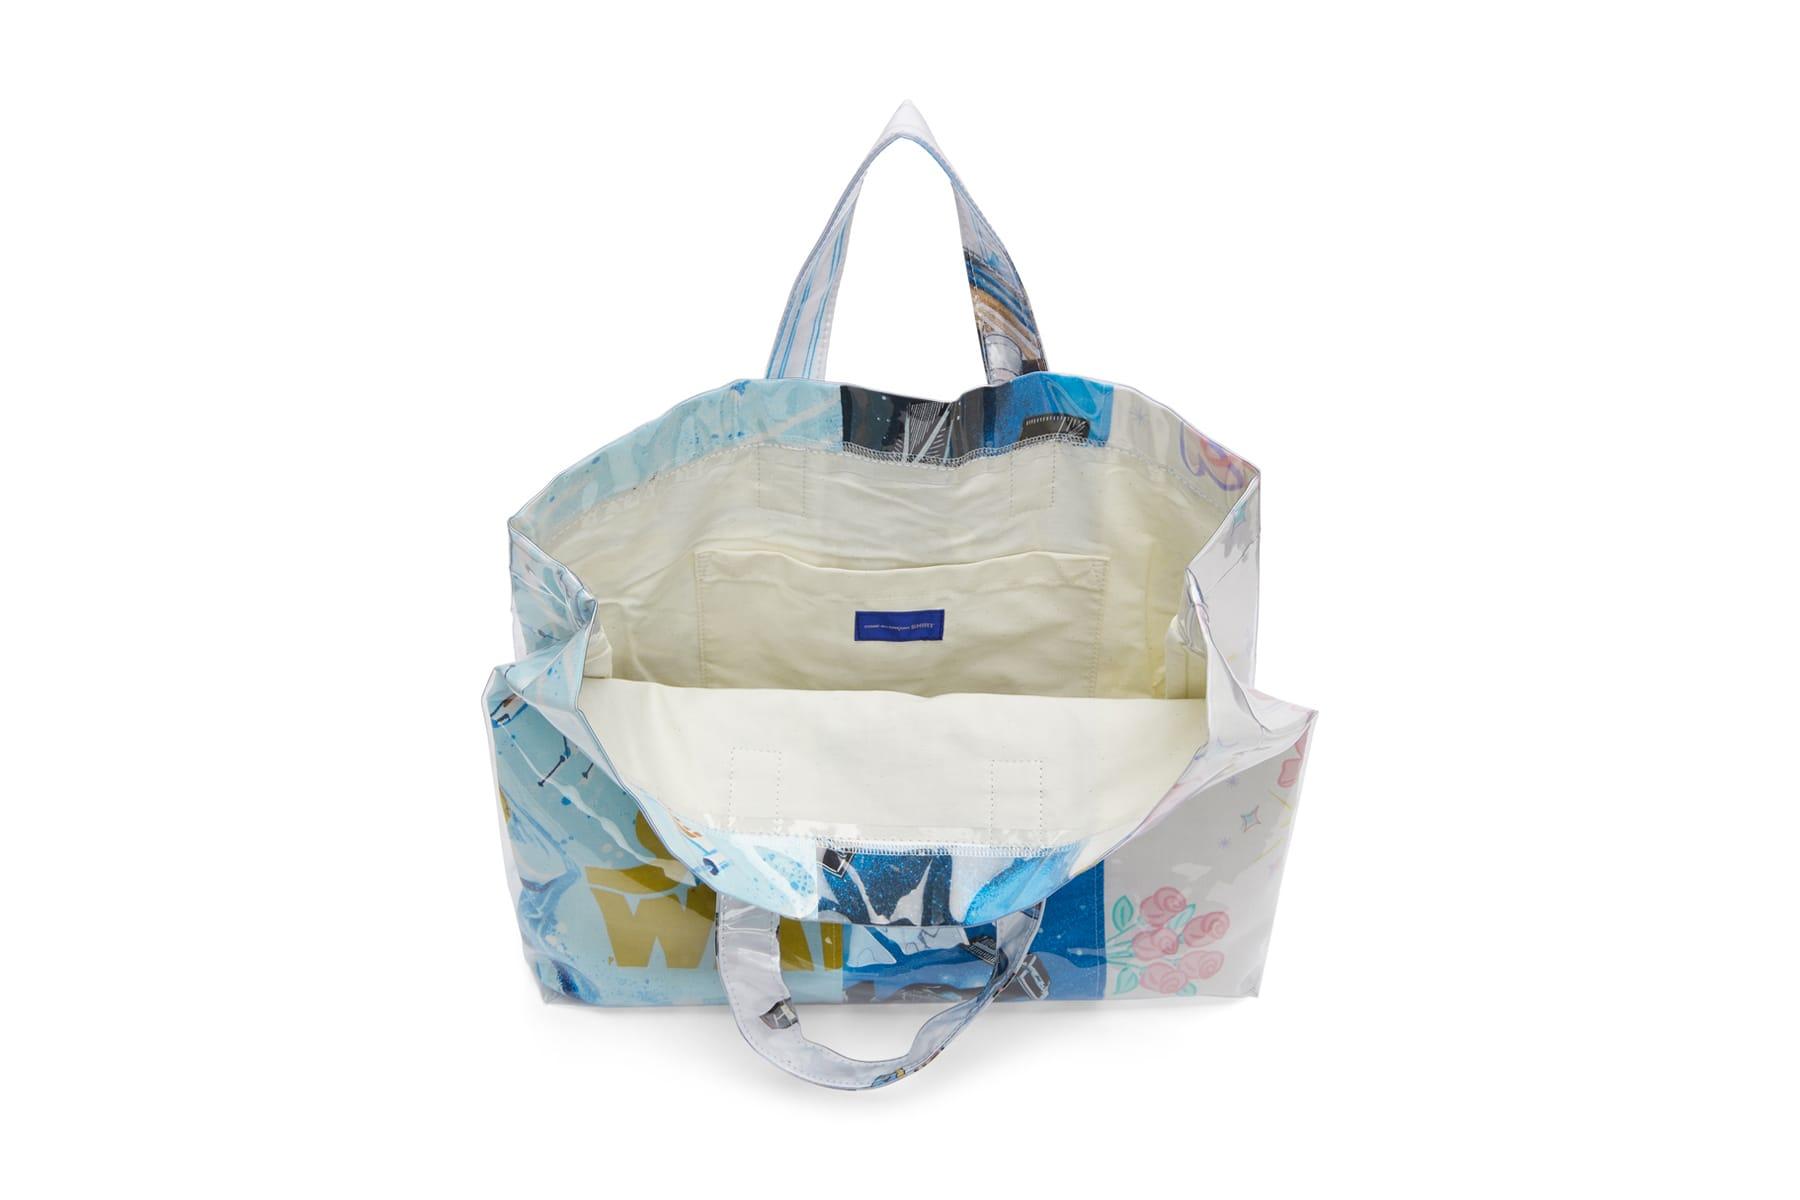 Comme Des Garcons Shirt Cdg Pvc Plastic Bedsheets Tote Bag 90s Star Wars  Barbie